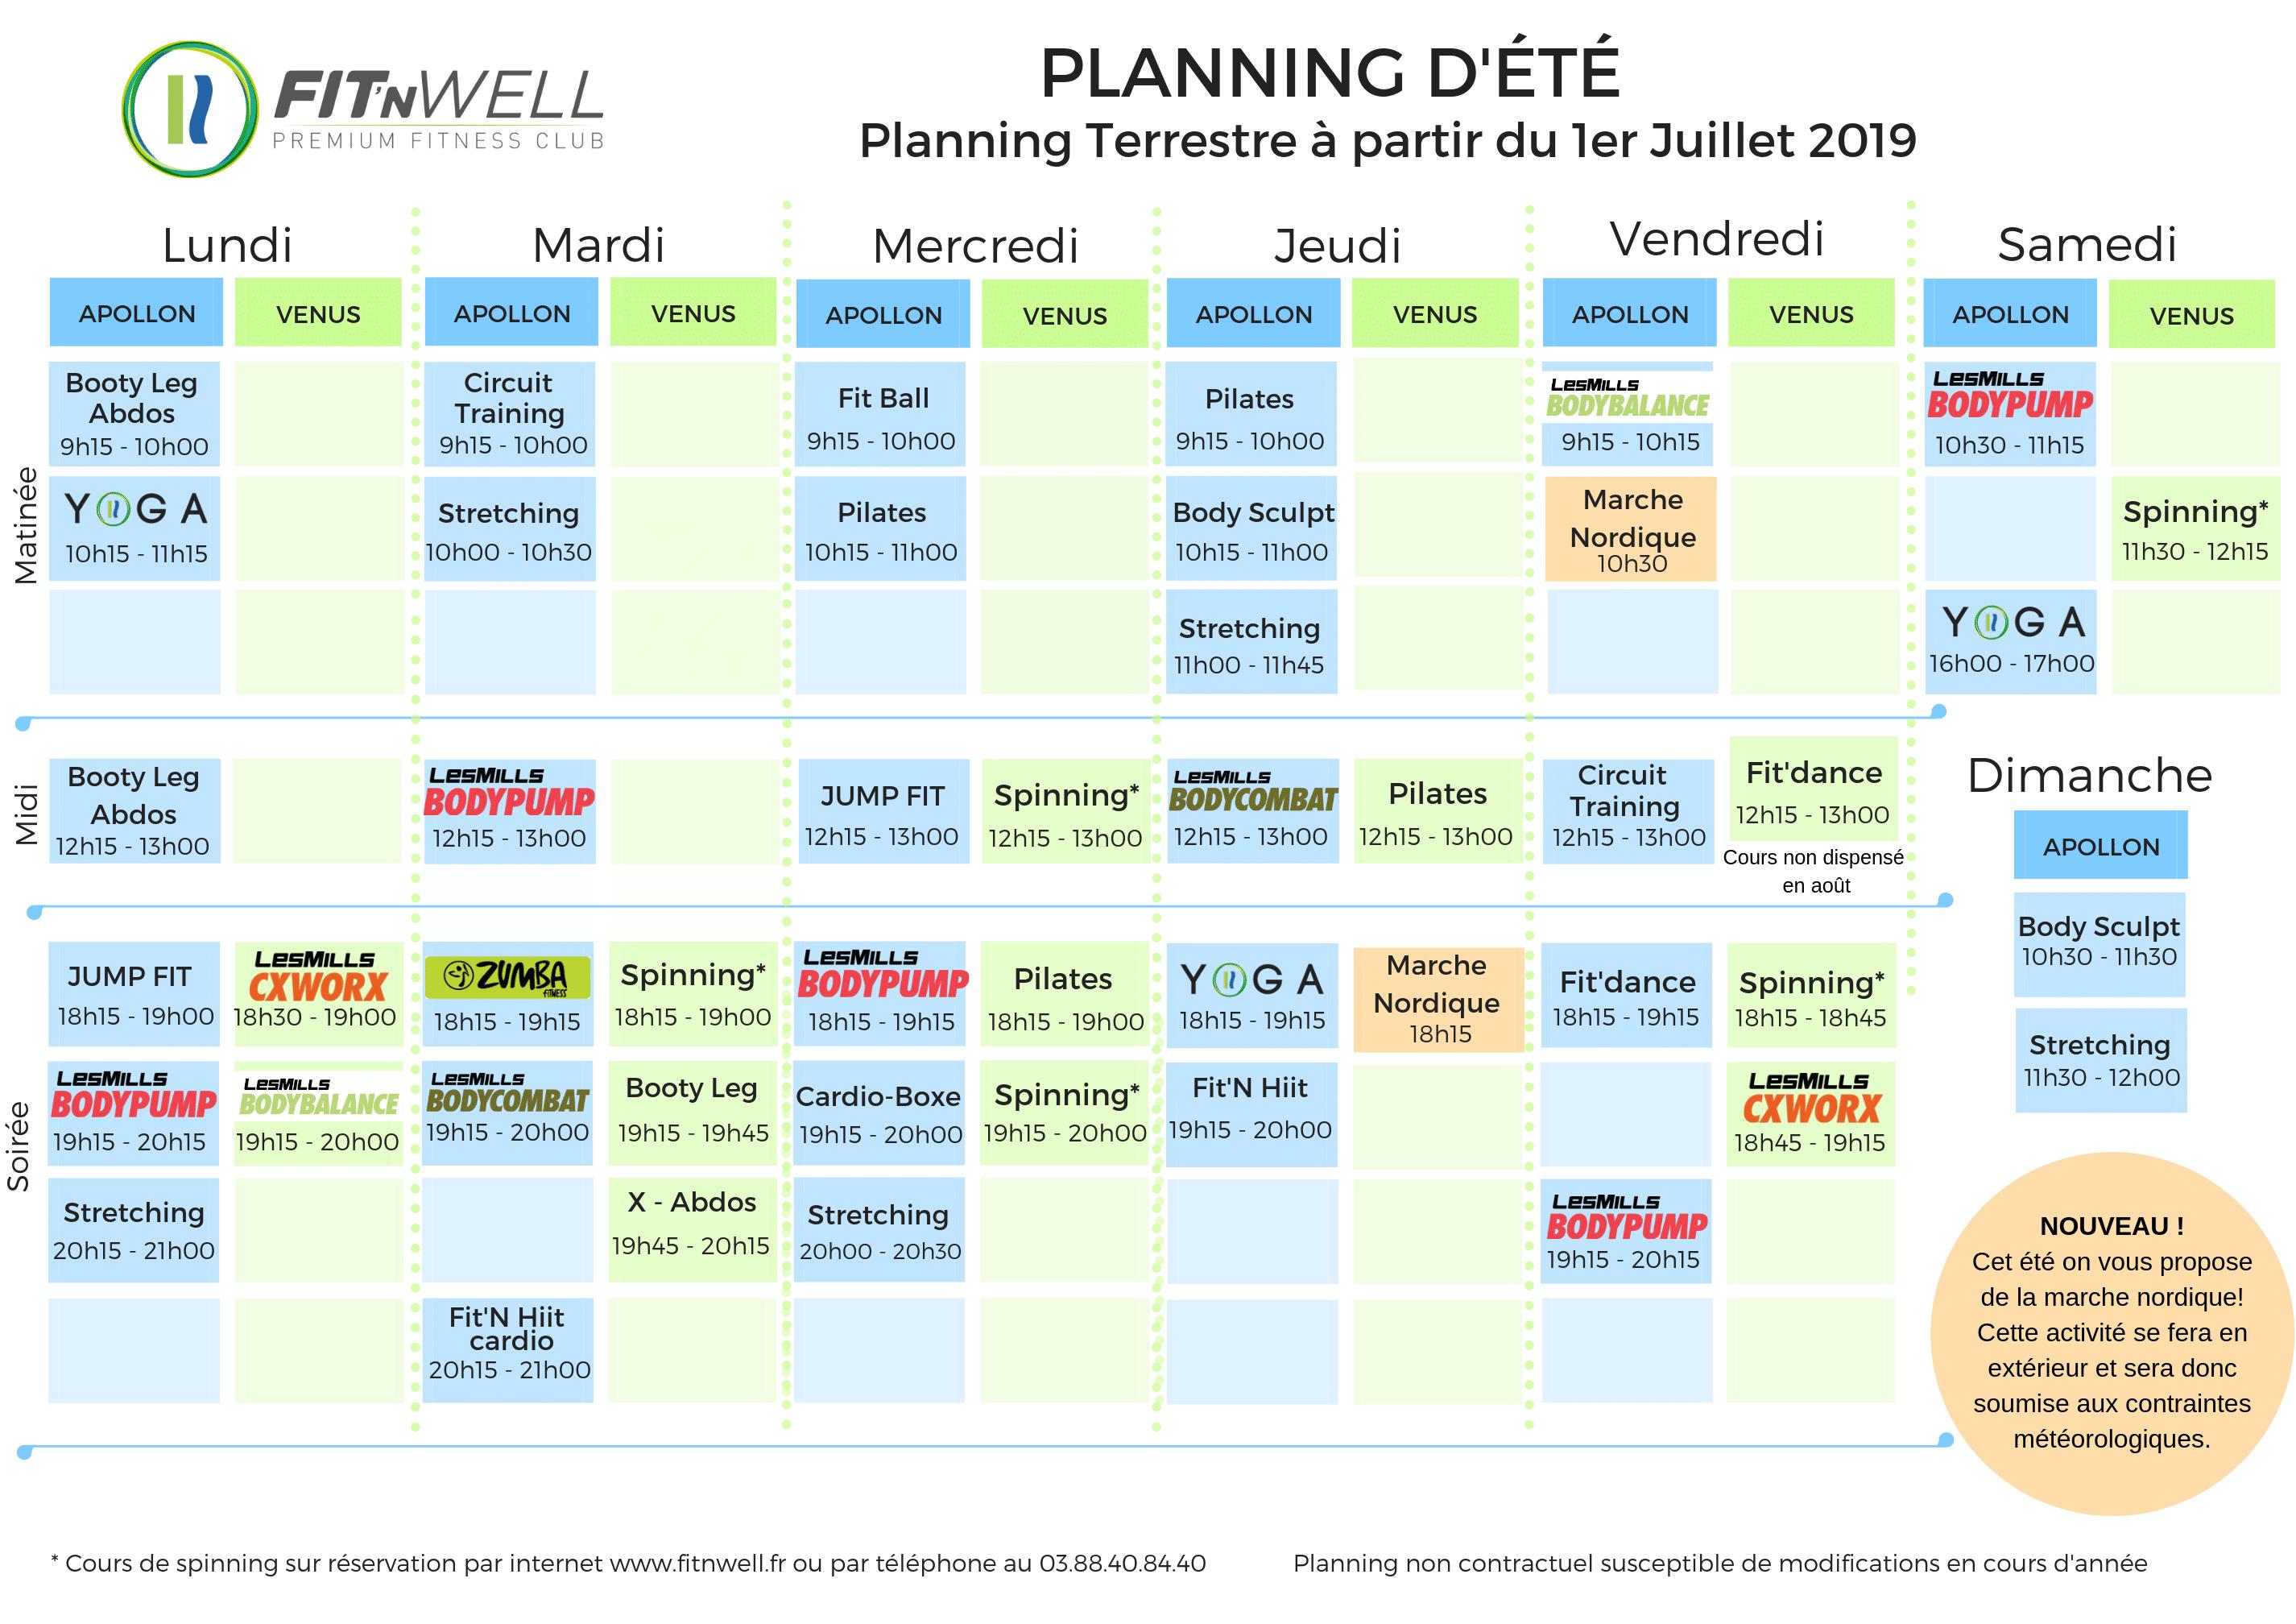 planning-terrestre-t-2019